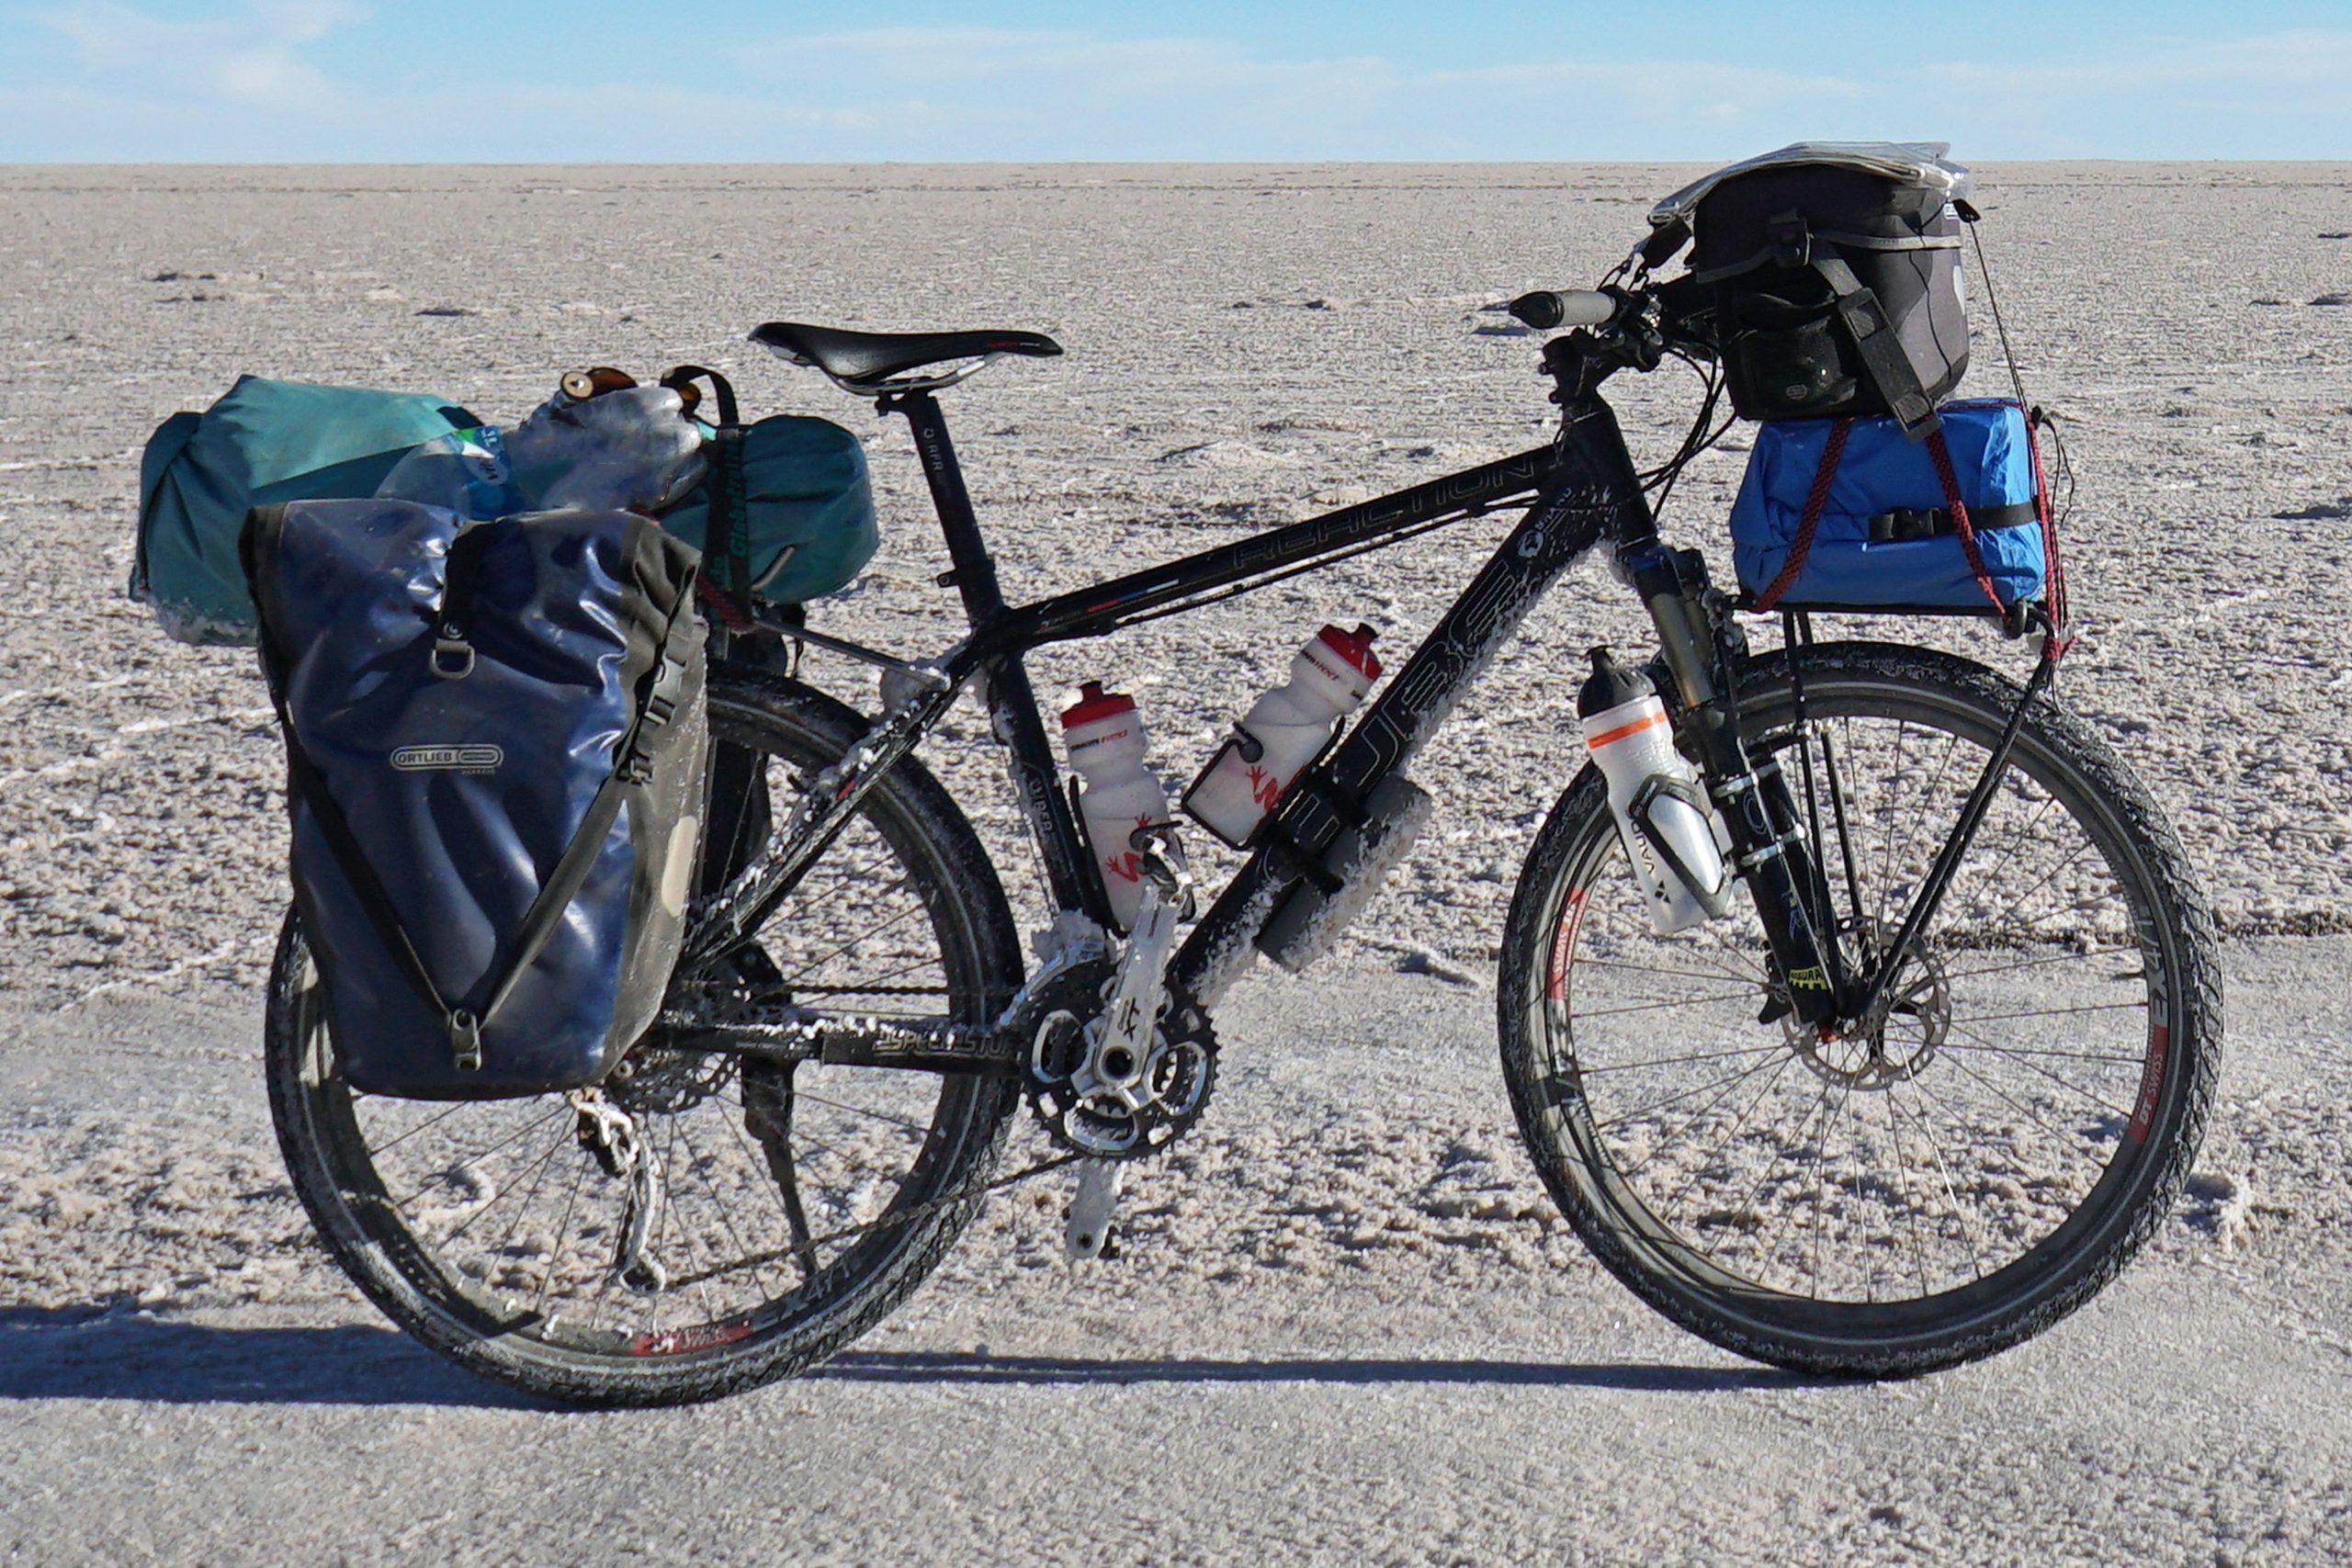 Radreise Südamerika 2019 - Salar de Uyuni - mein Reiserad